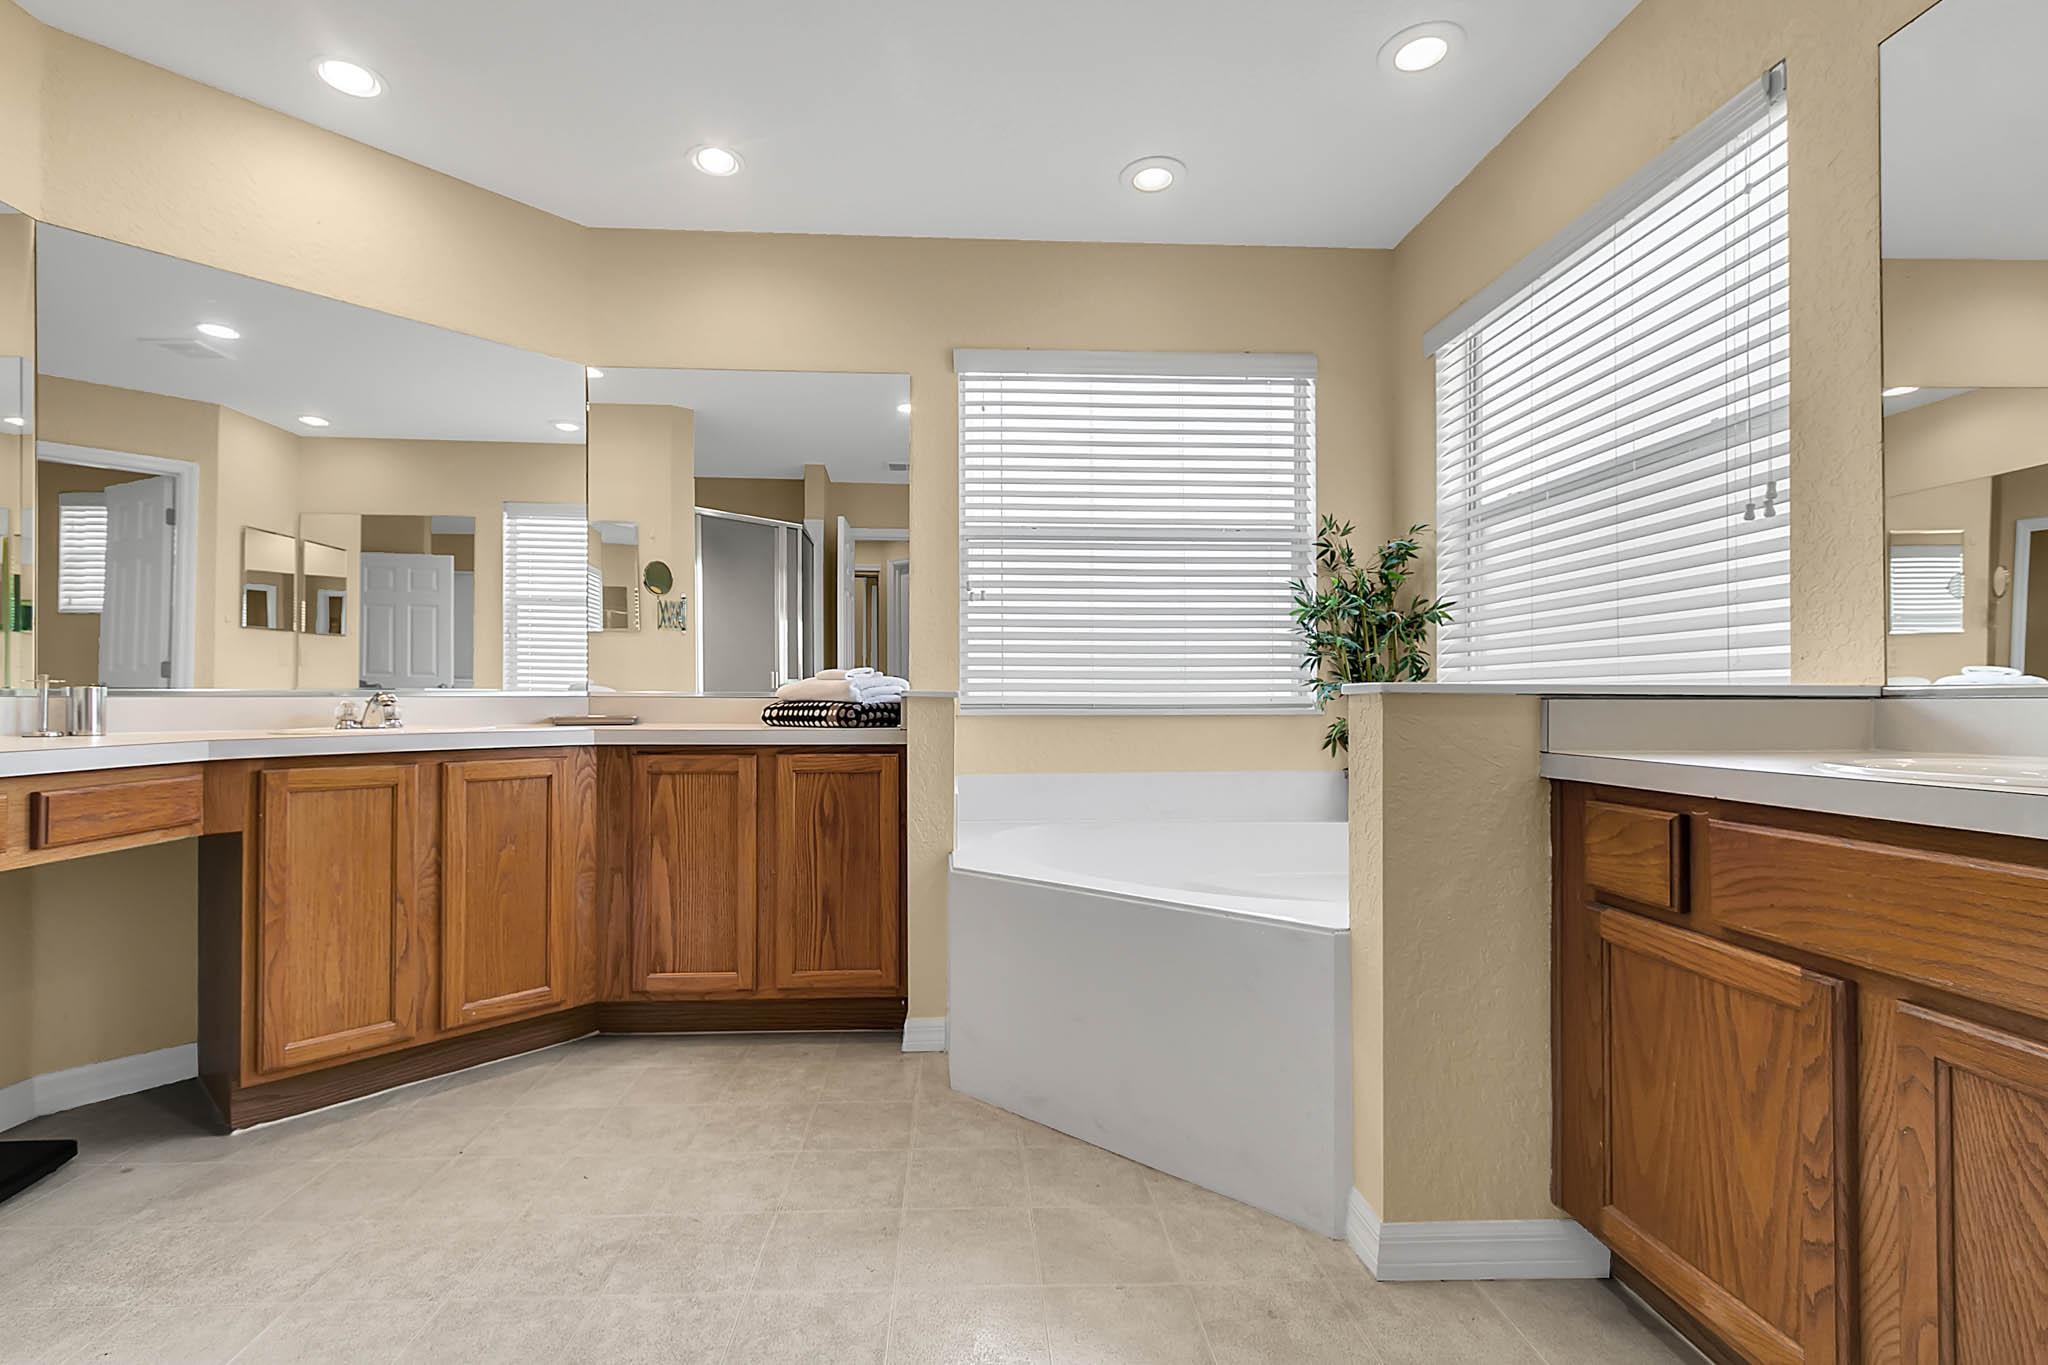 229-N-Hampton-Dr--Davenport--FL-33897----20---Master-Bathroom.jpg